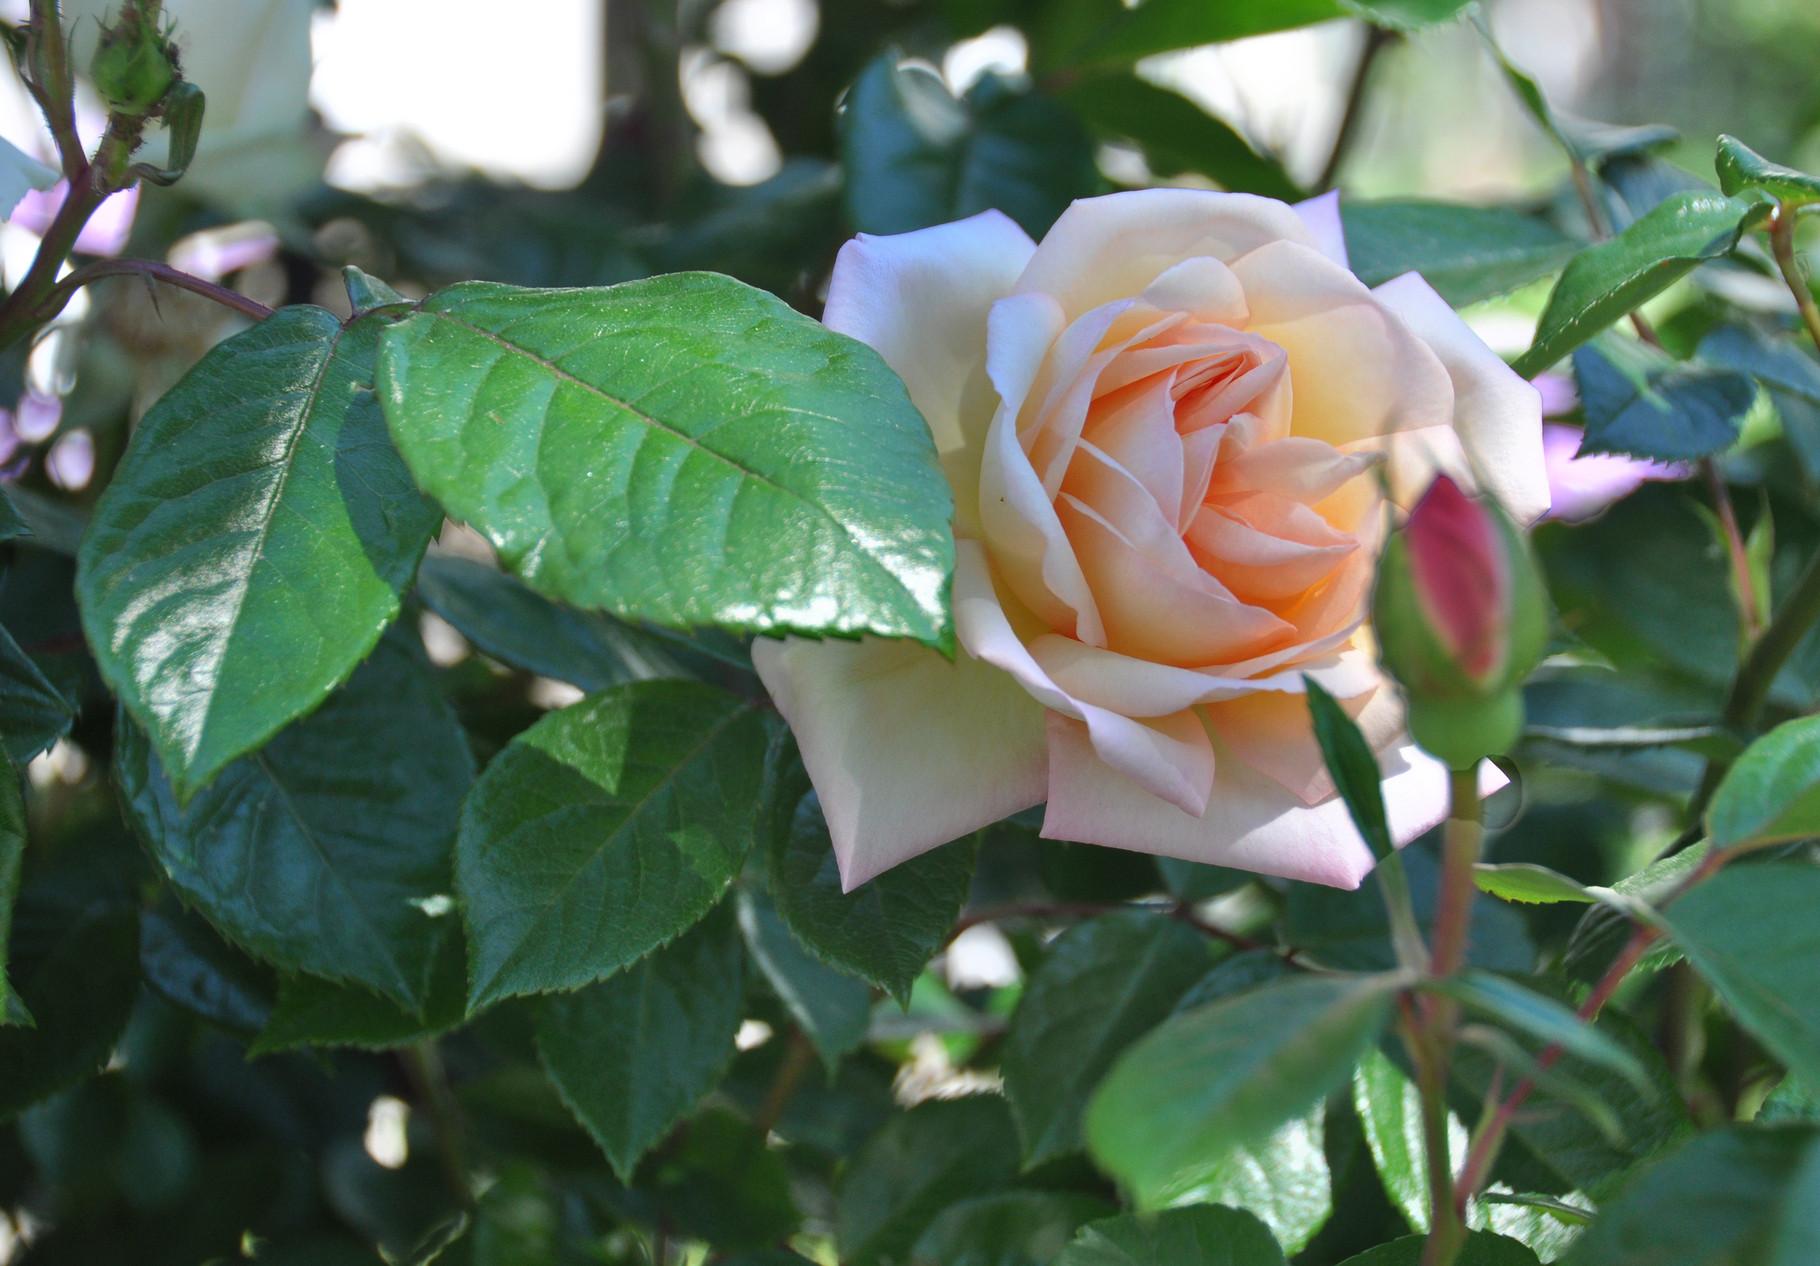 Rosen in Nachbars Garten I